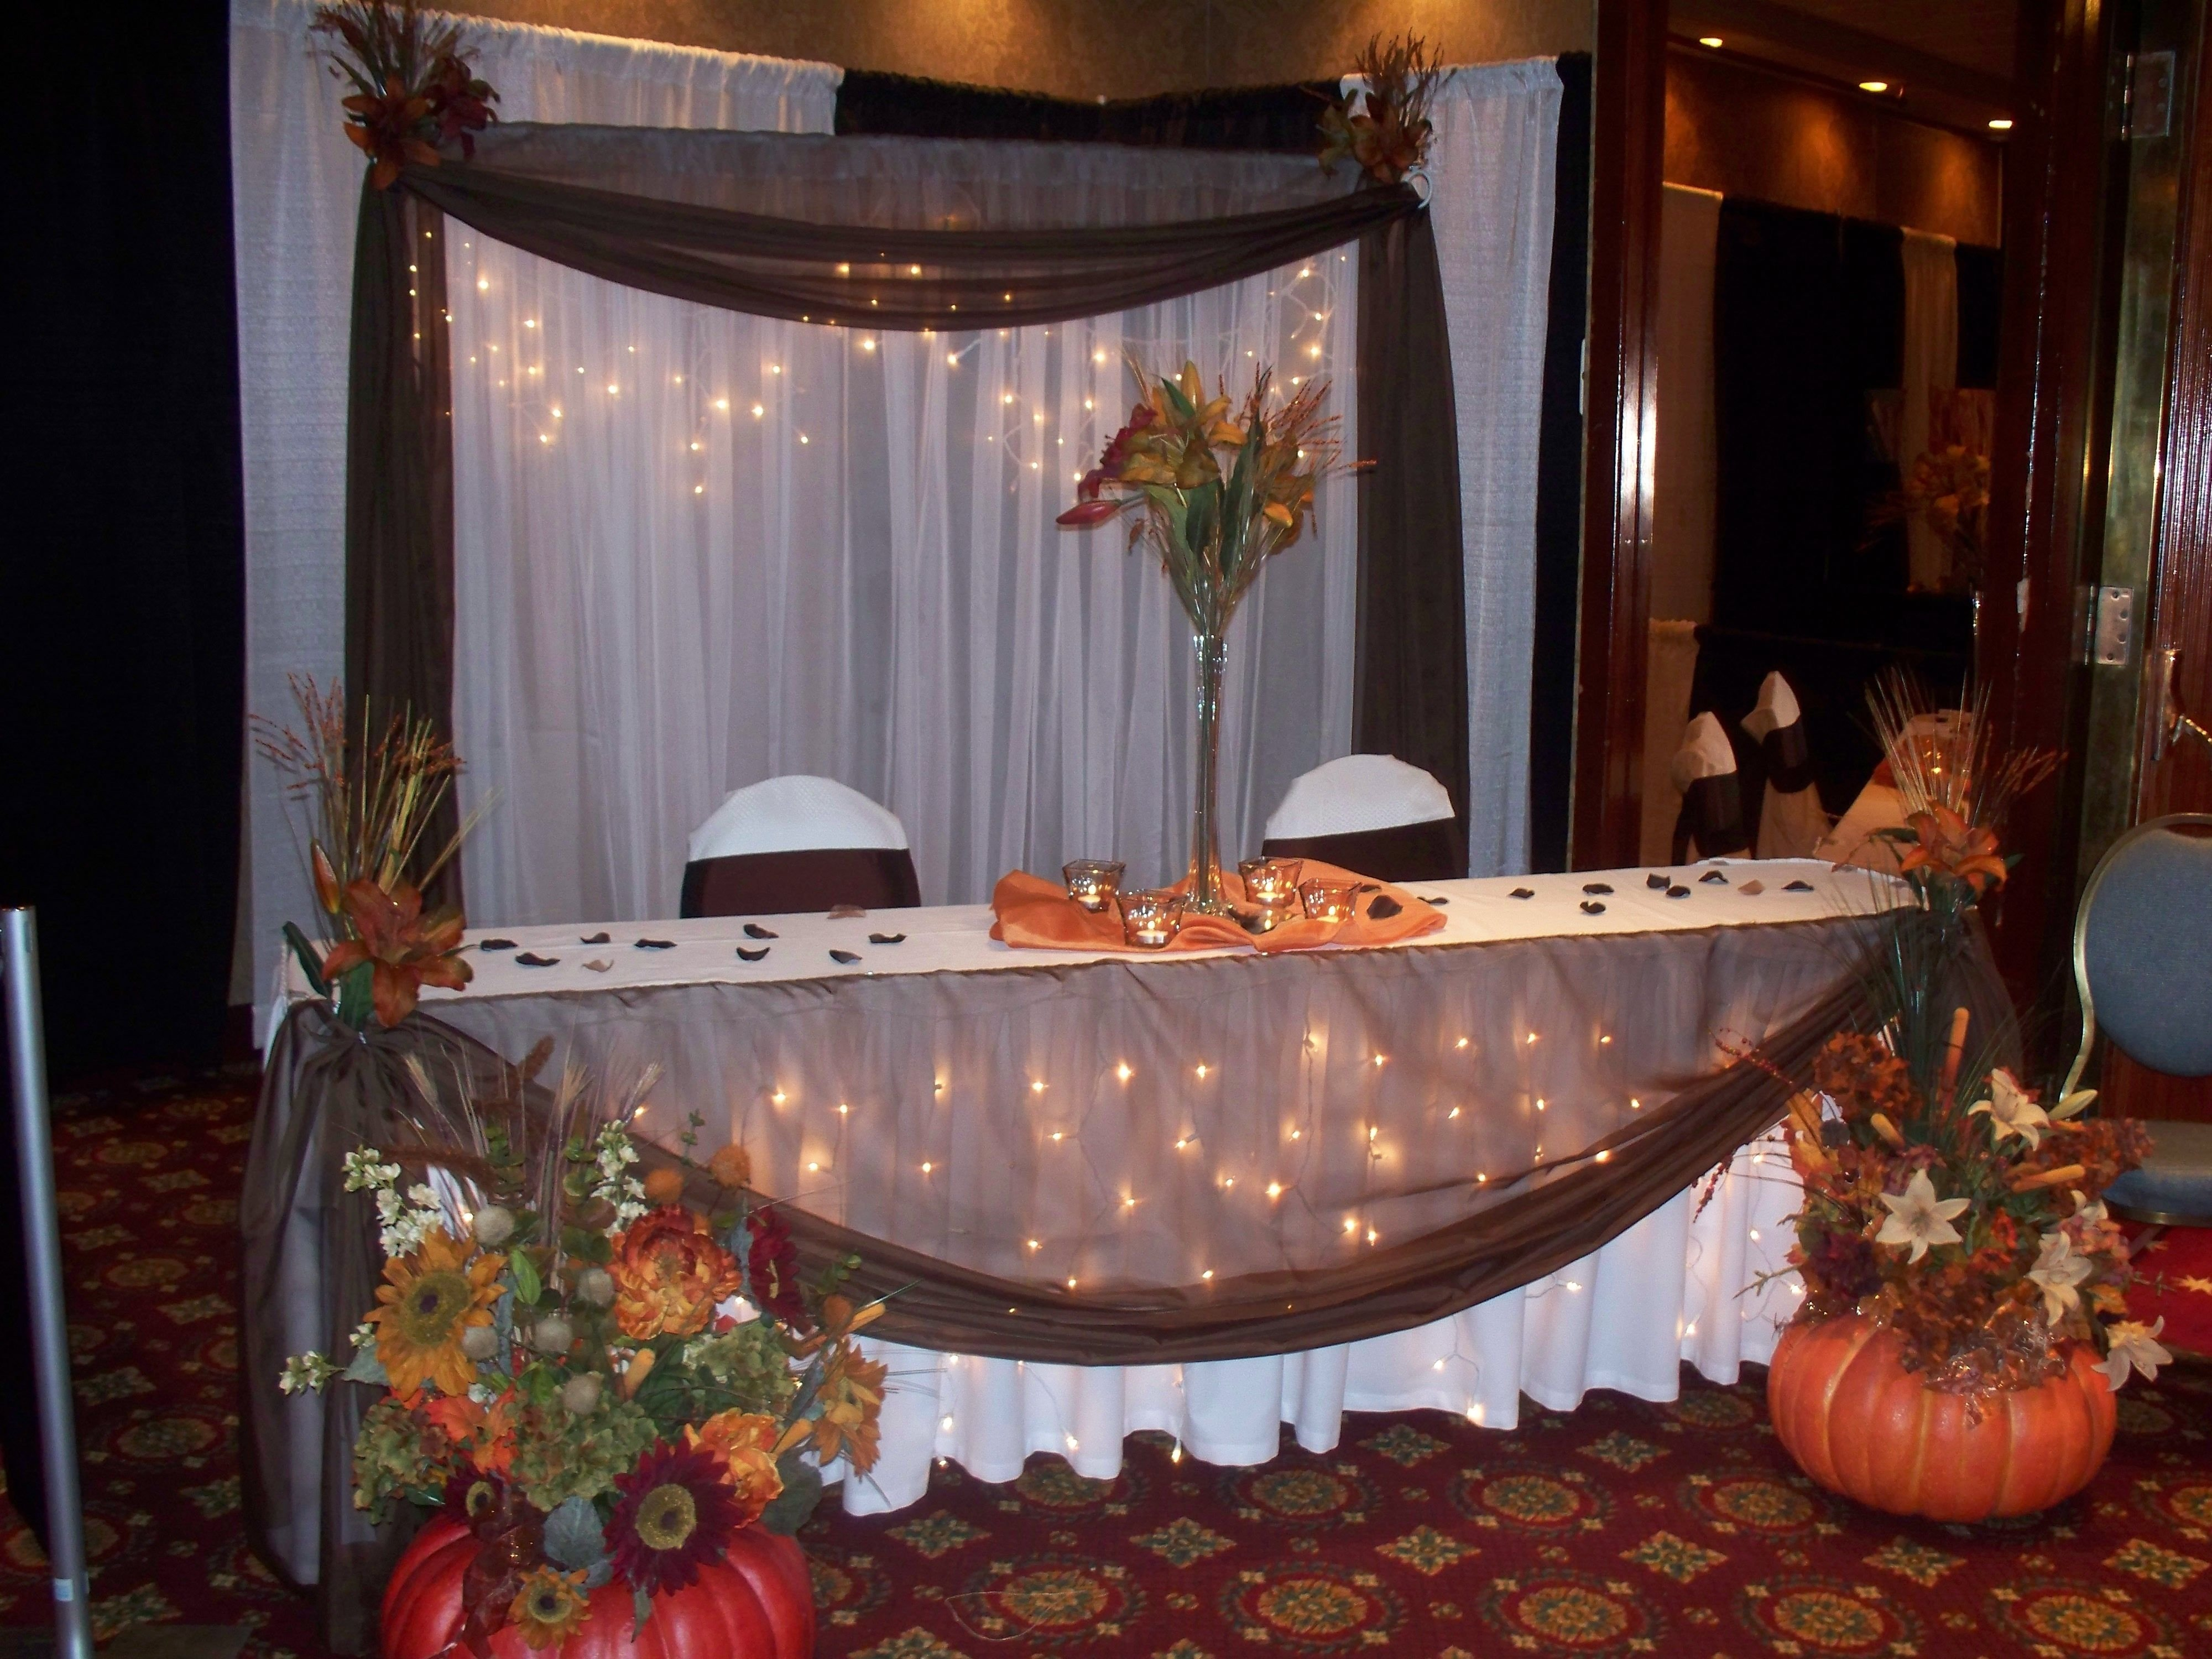 10 Wonderful Wedding Theme Ideas For Fall fall wedding centerpieces on a budget autumn wedding decor 300x225 2 2020